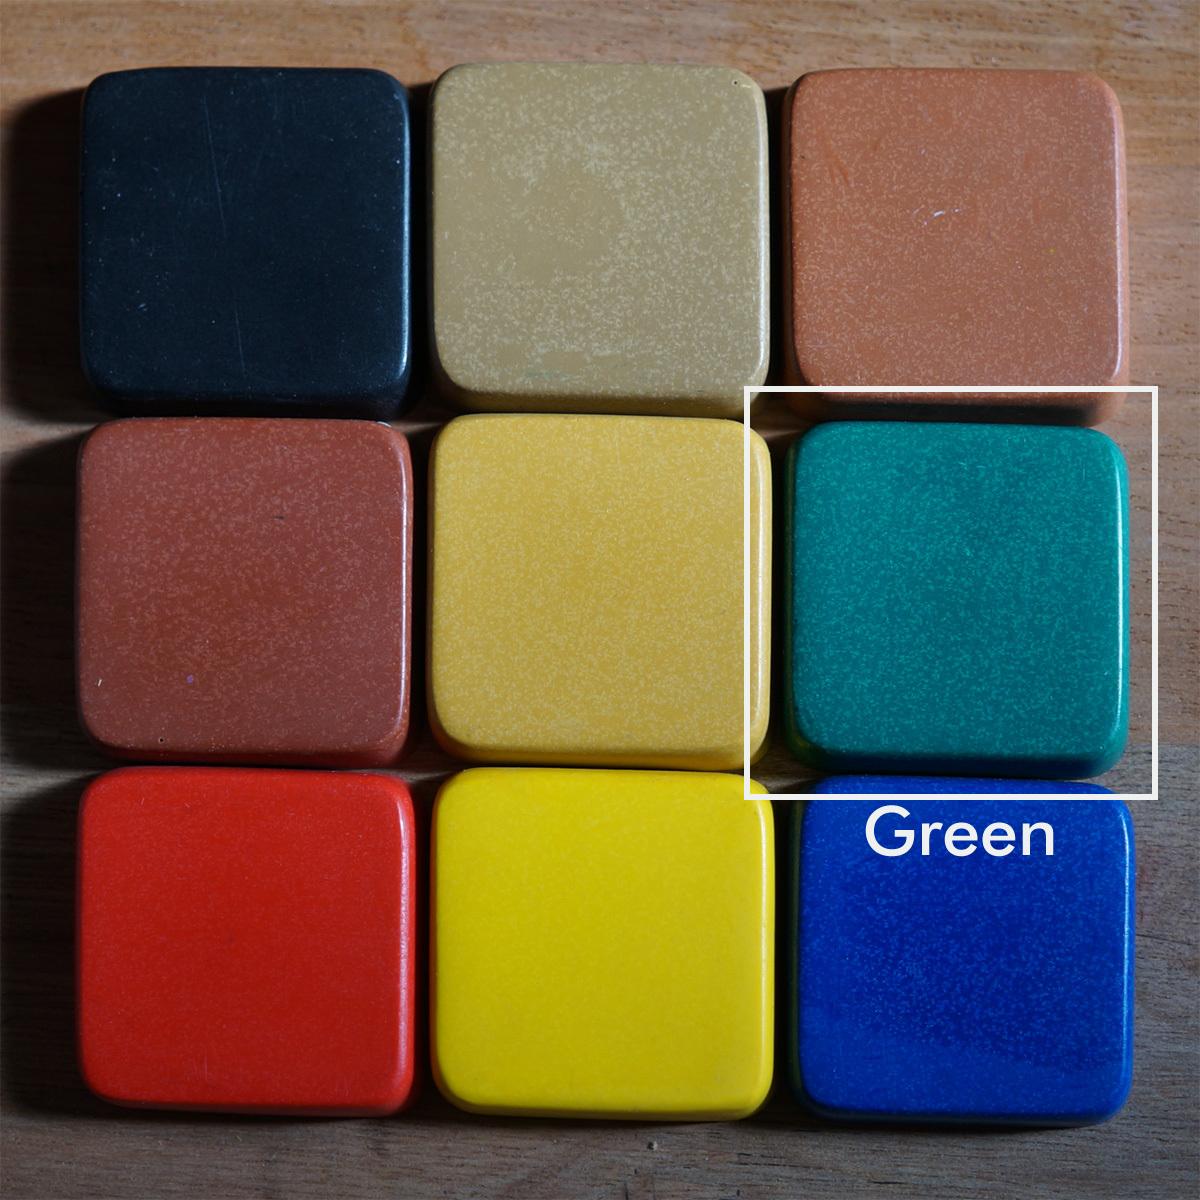 PIGMENT GREEN 300g(着色剤:緑 300g) - 画像2